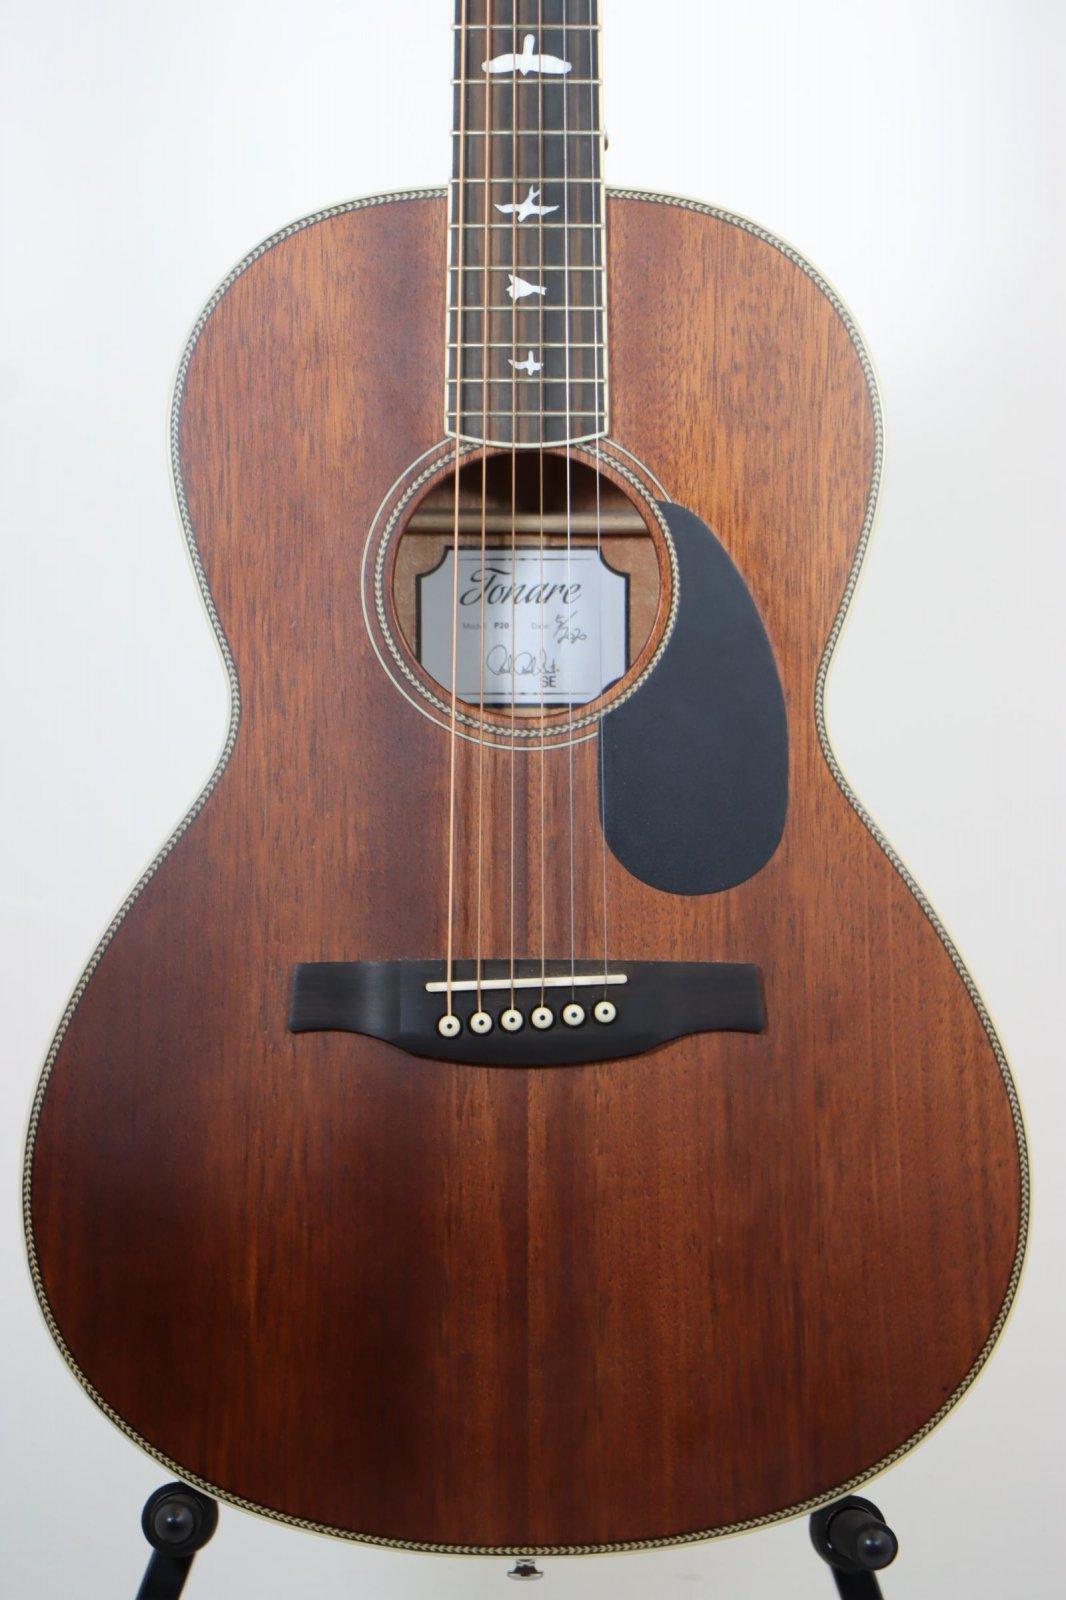 USED PRS SE P20 Parlor Acoustic Guitar - Vintage Mahogany w/Gig Bag